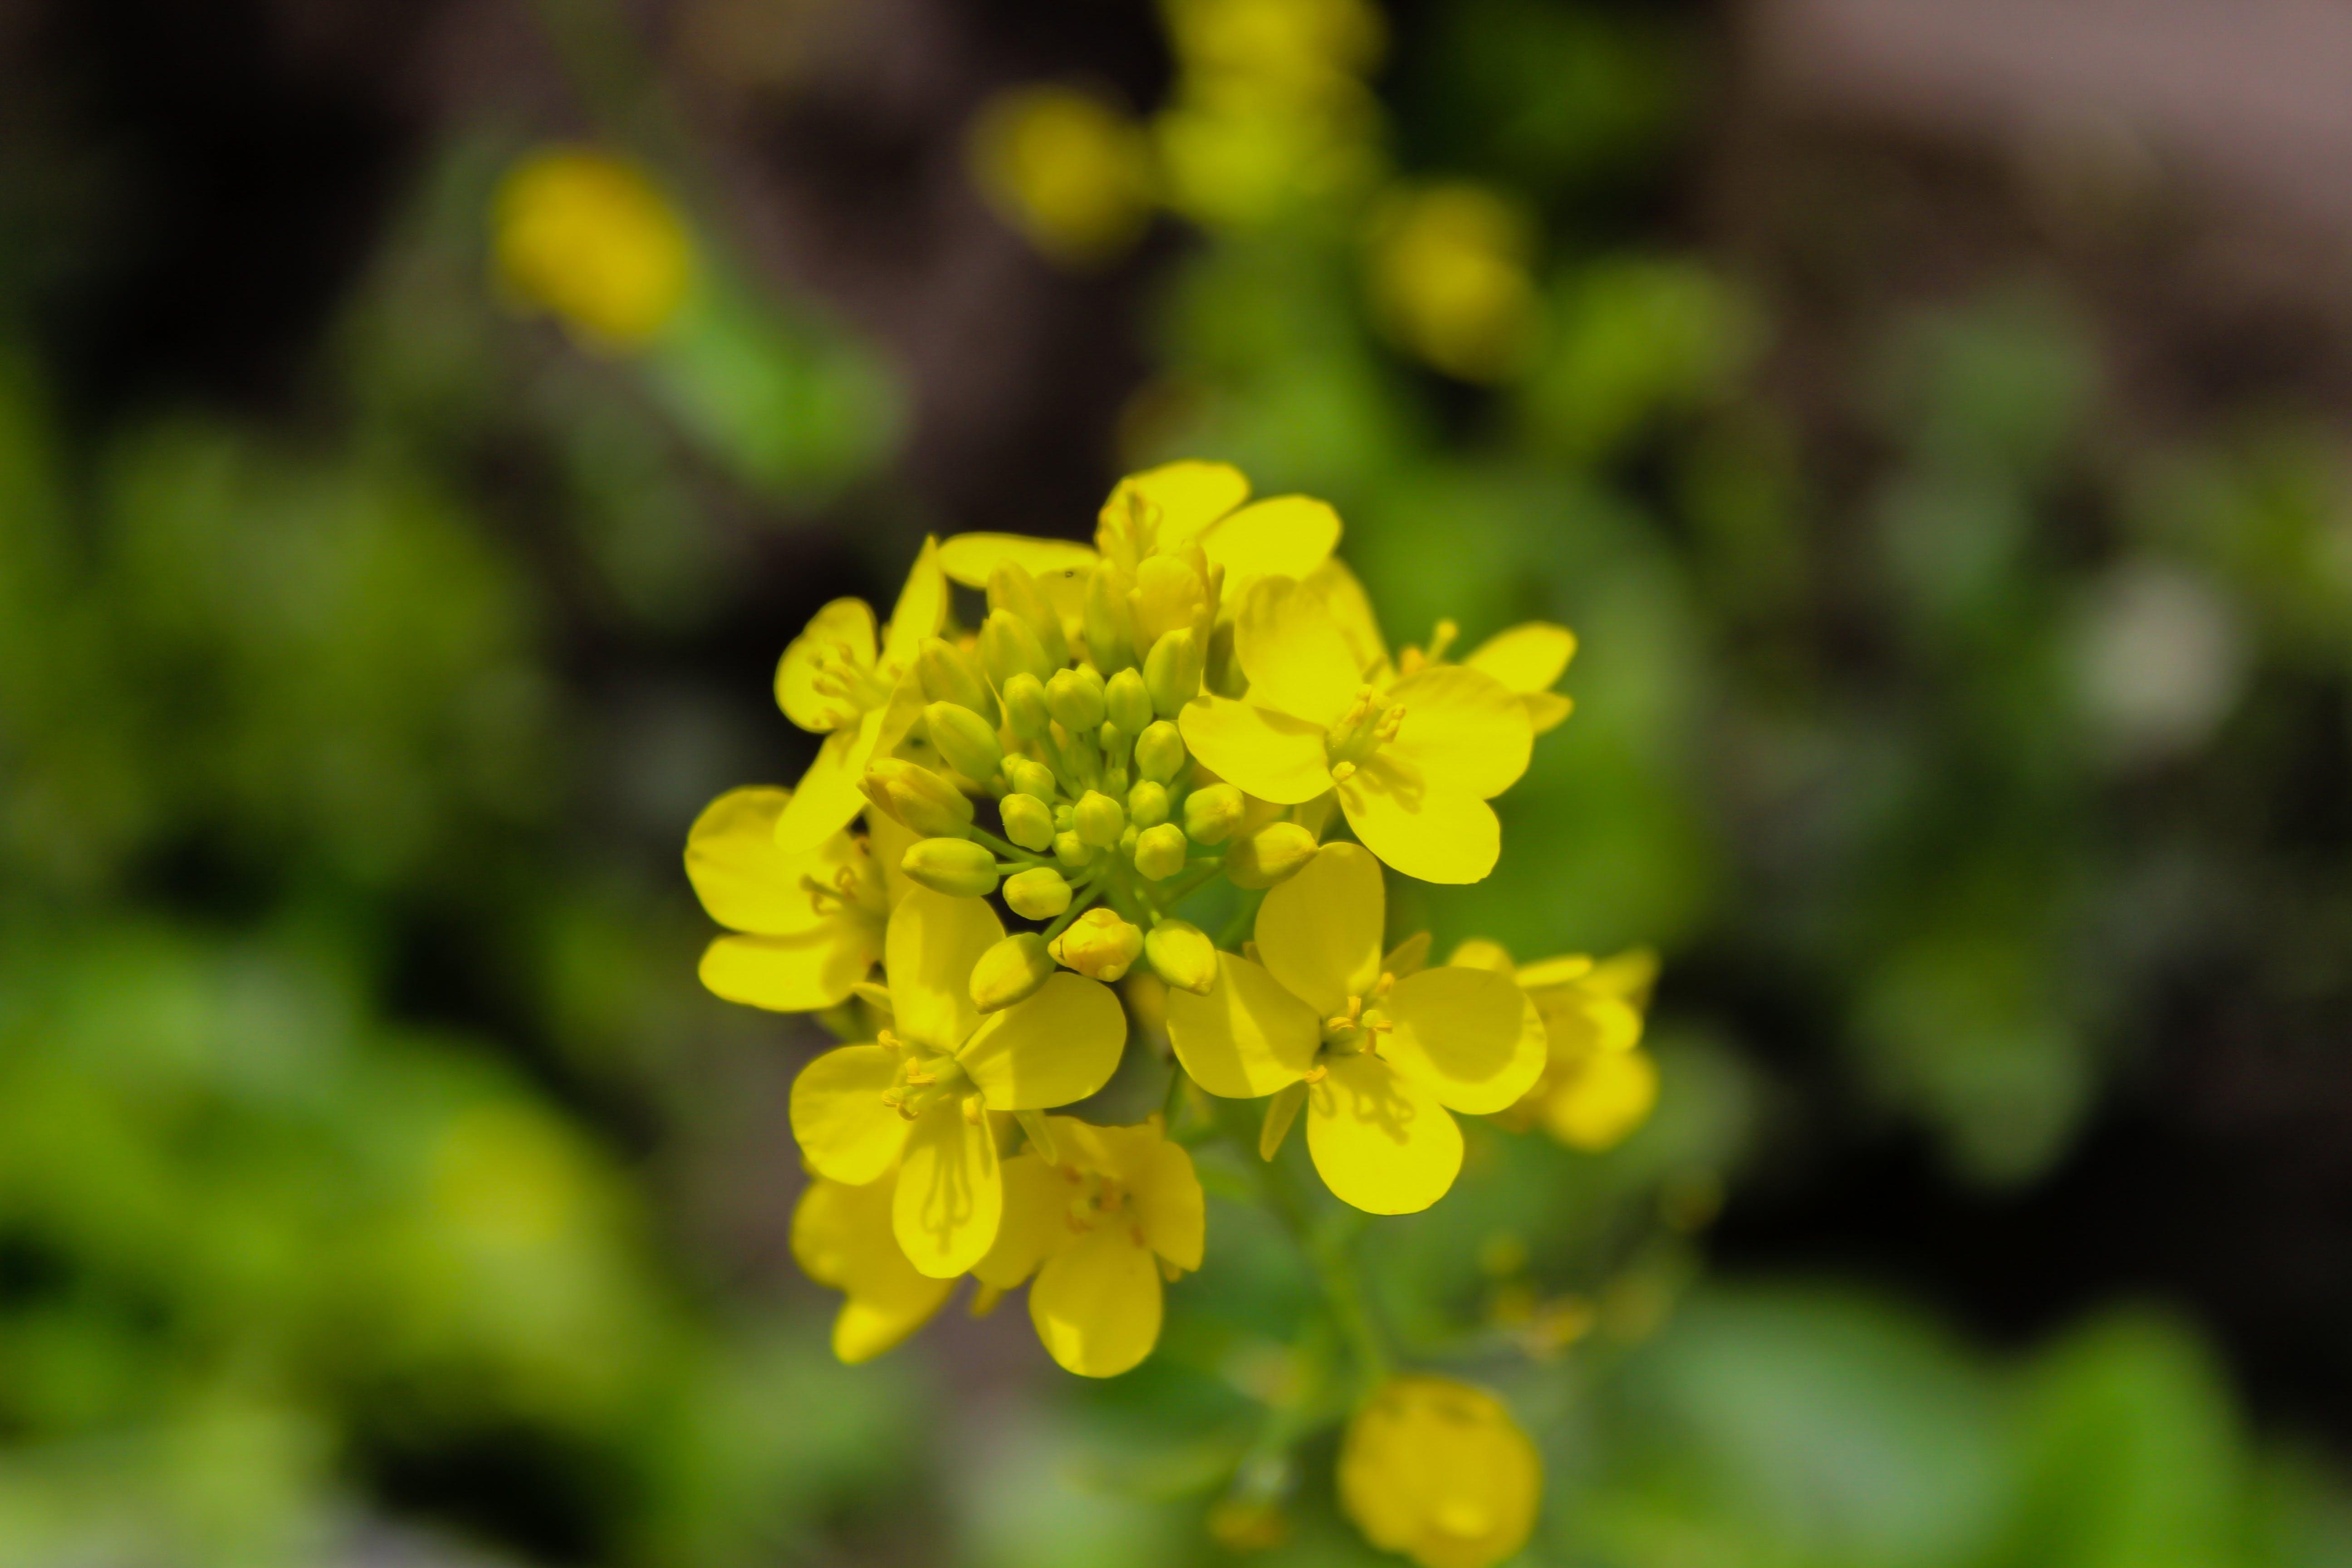 Free stock photo of flower, fresh flowers, yellow flower, yellow flowers